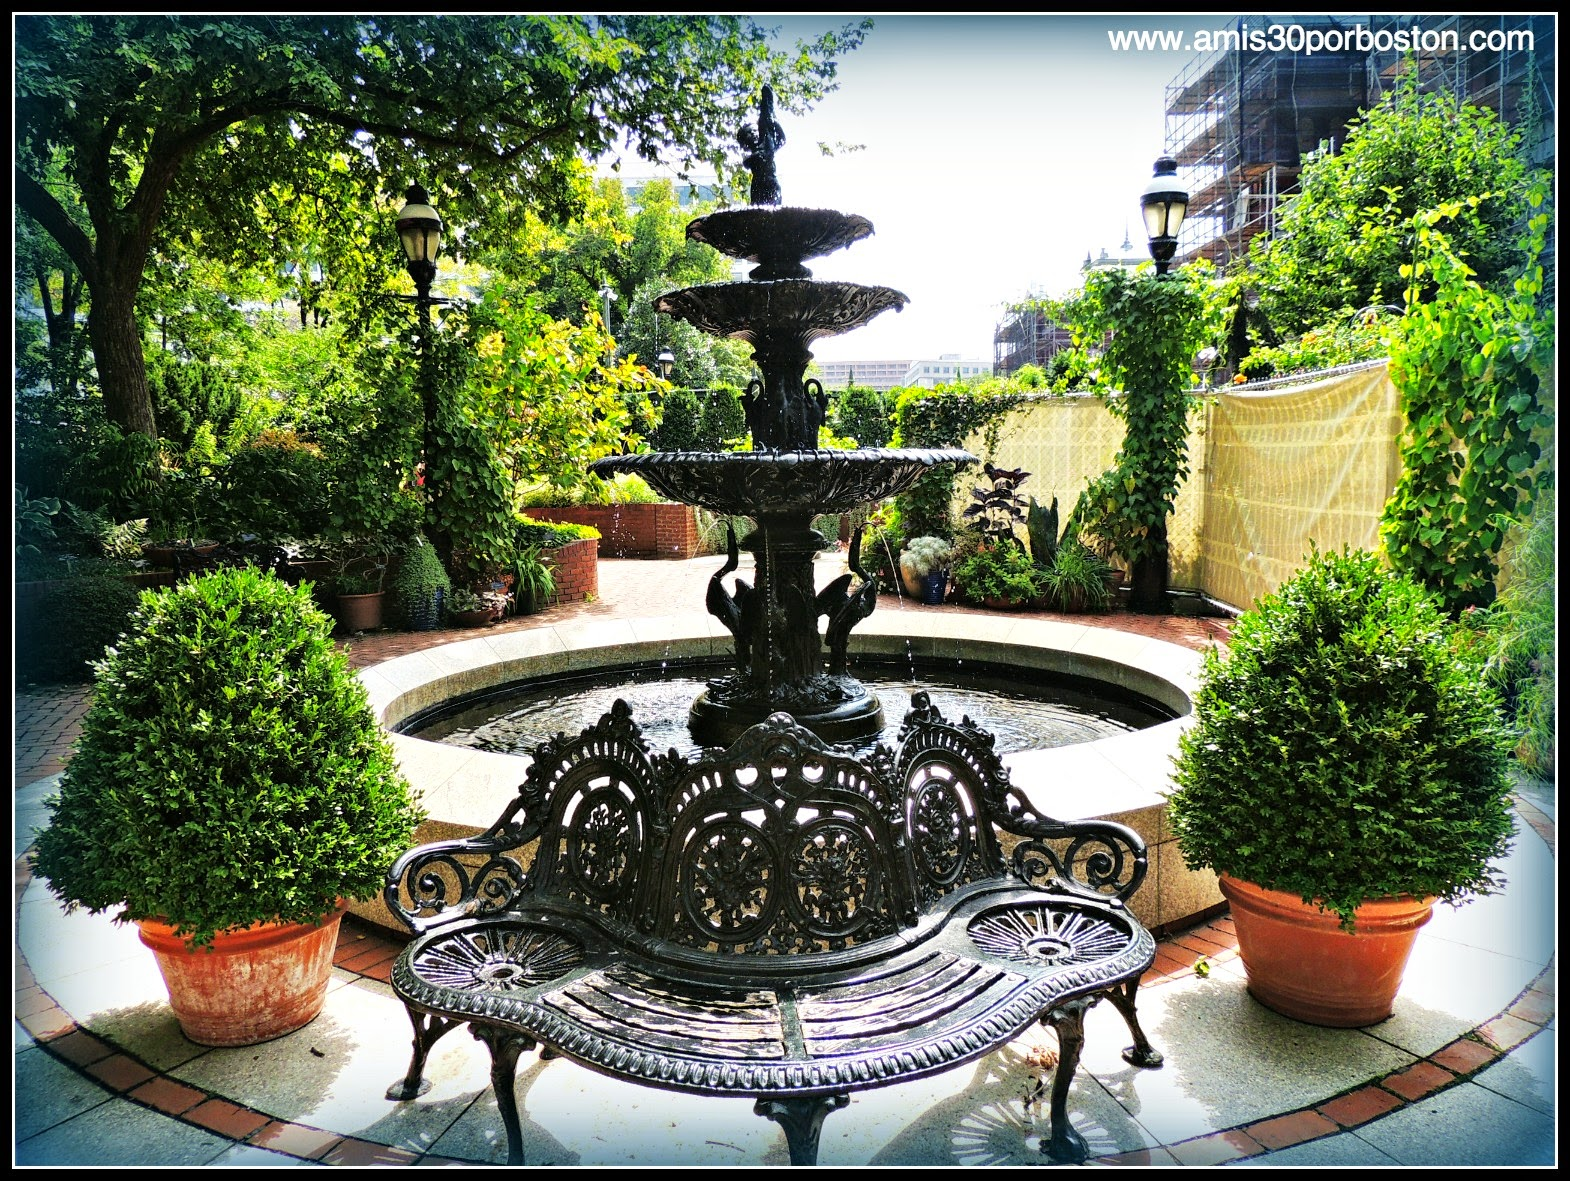 Jardín en el National Mall, Washington, D.C.